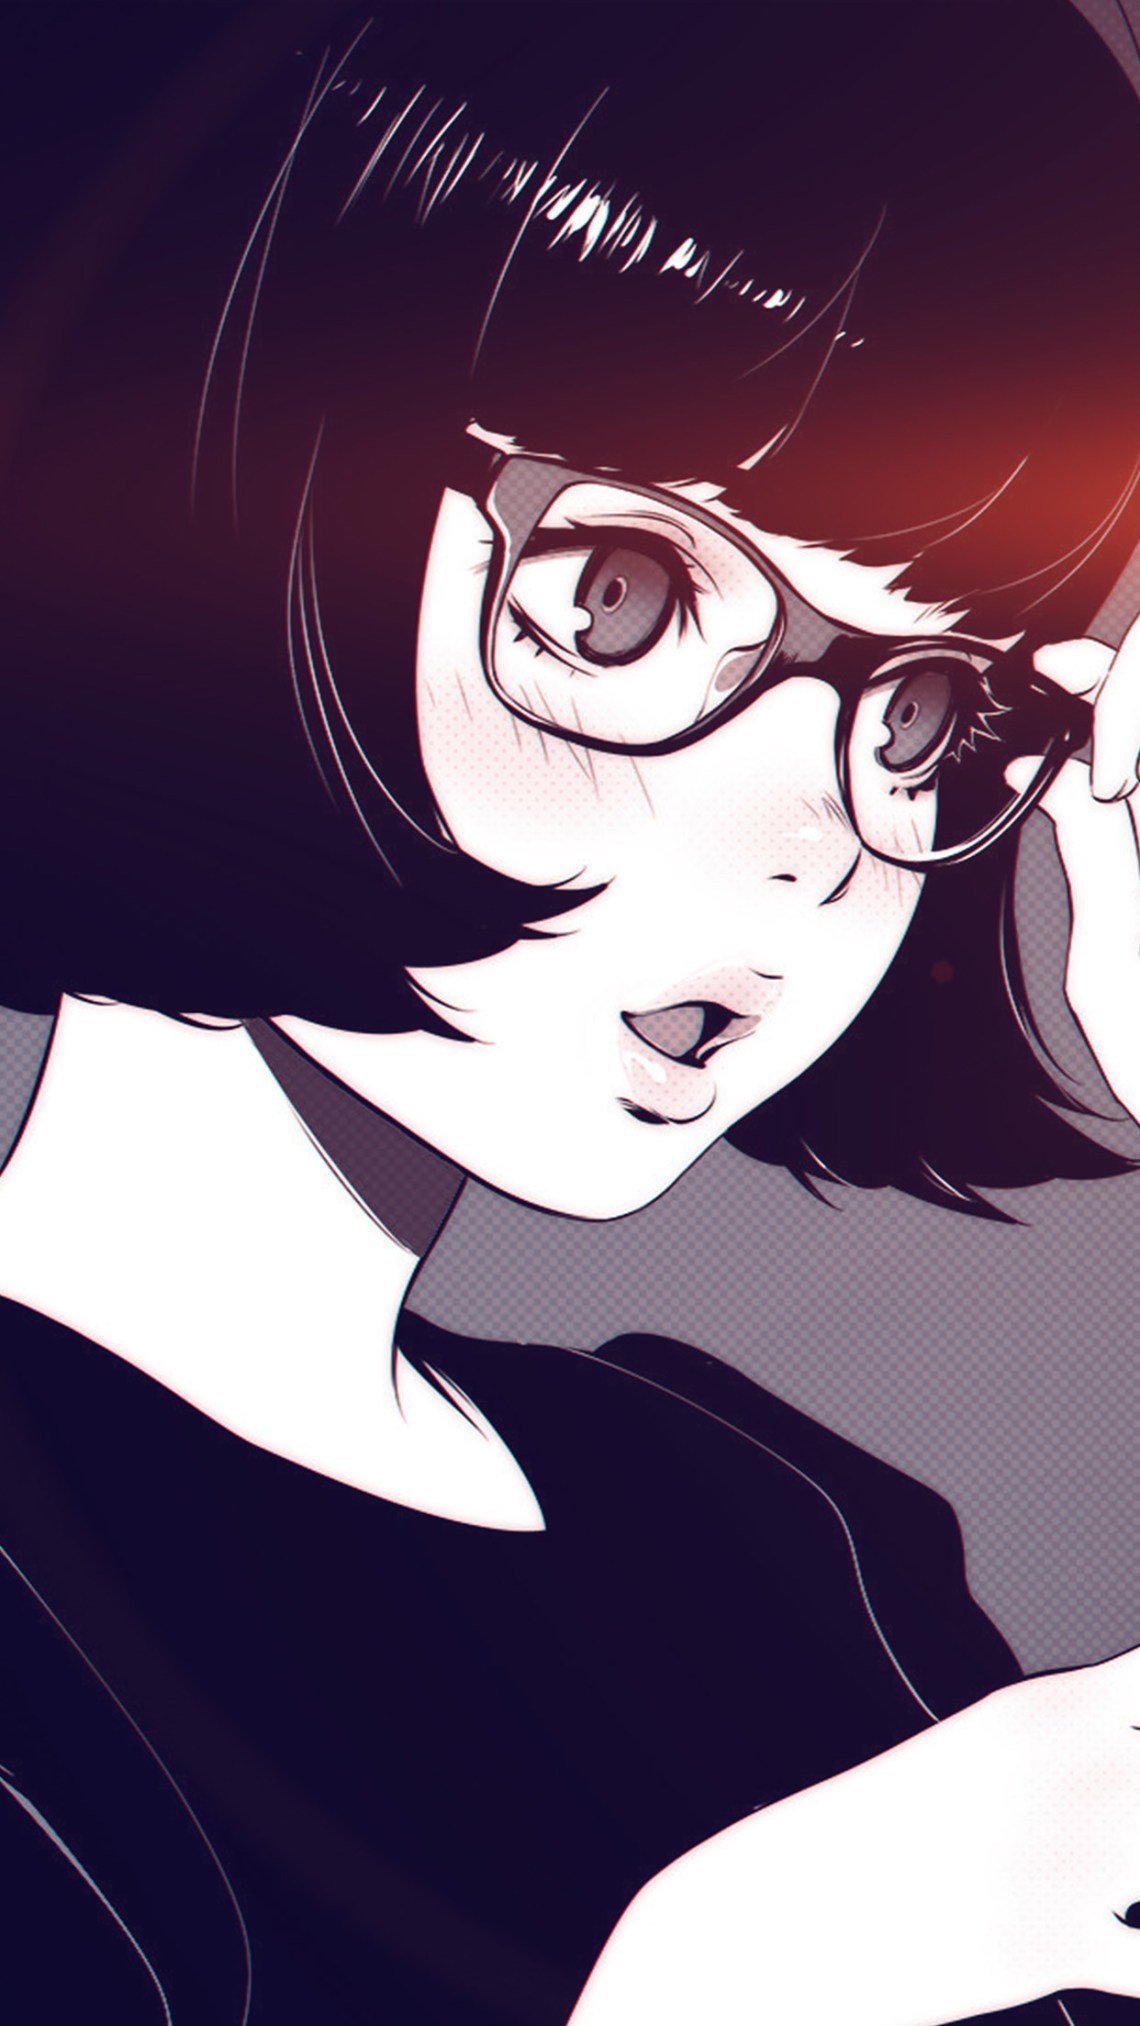 Iphone 6 Plus Data Src Free Download Cool Anime Iphone Anime Dark Wallpapers Iphone 1242x2208 Wallpaper Teahub Io